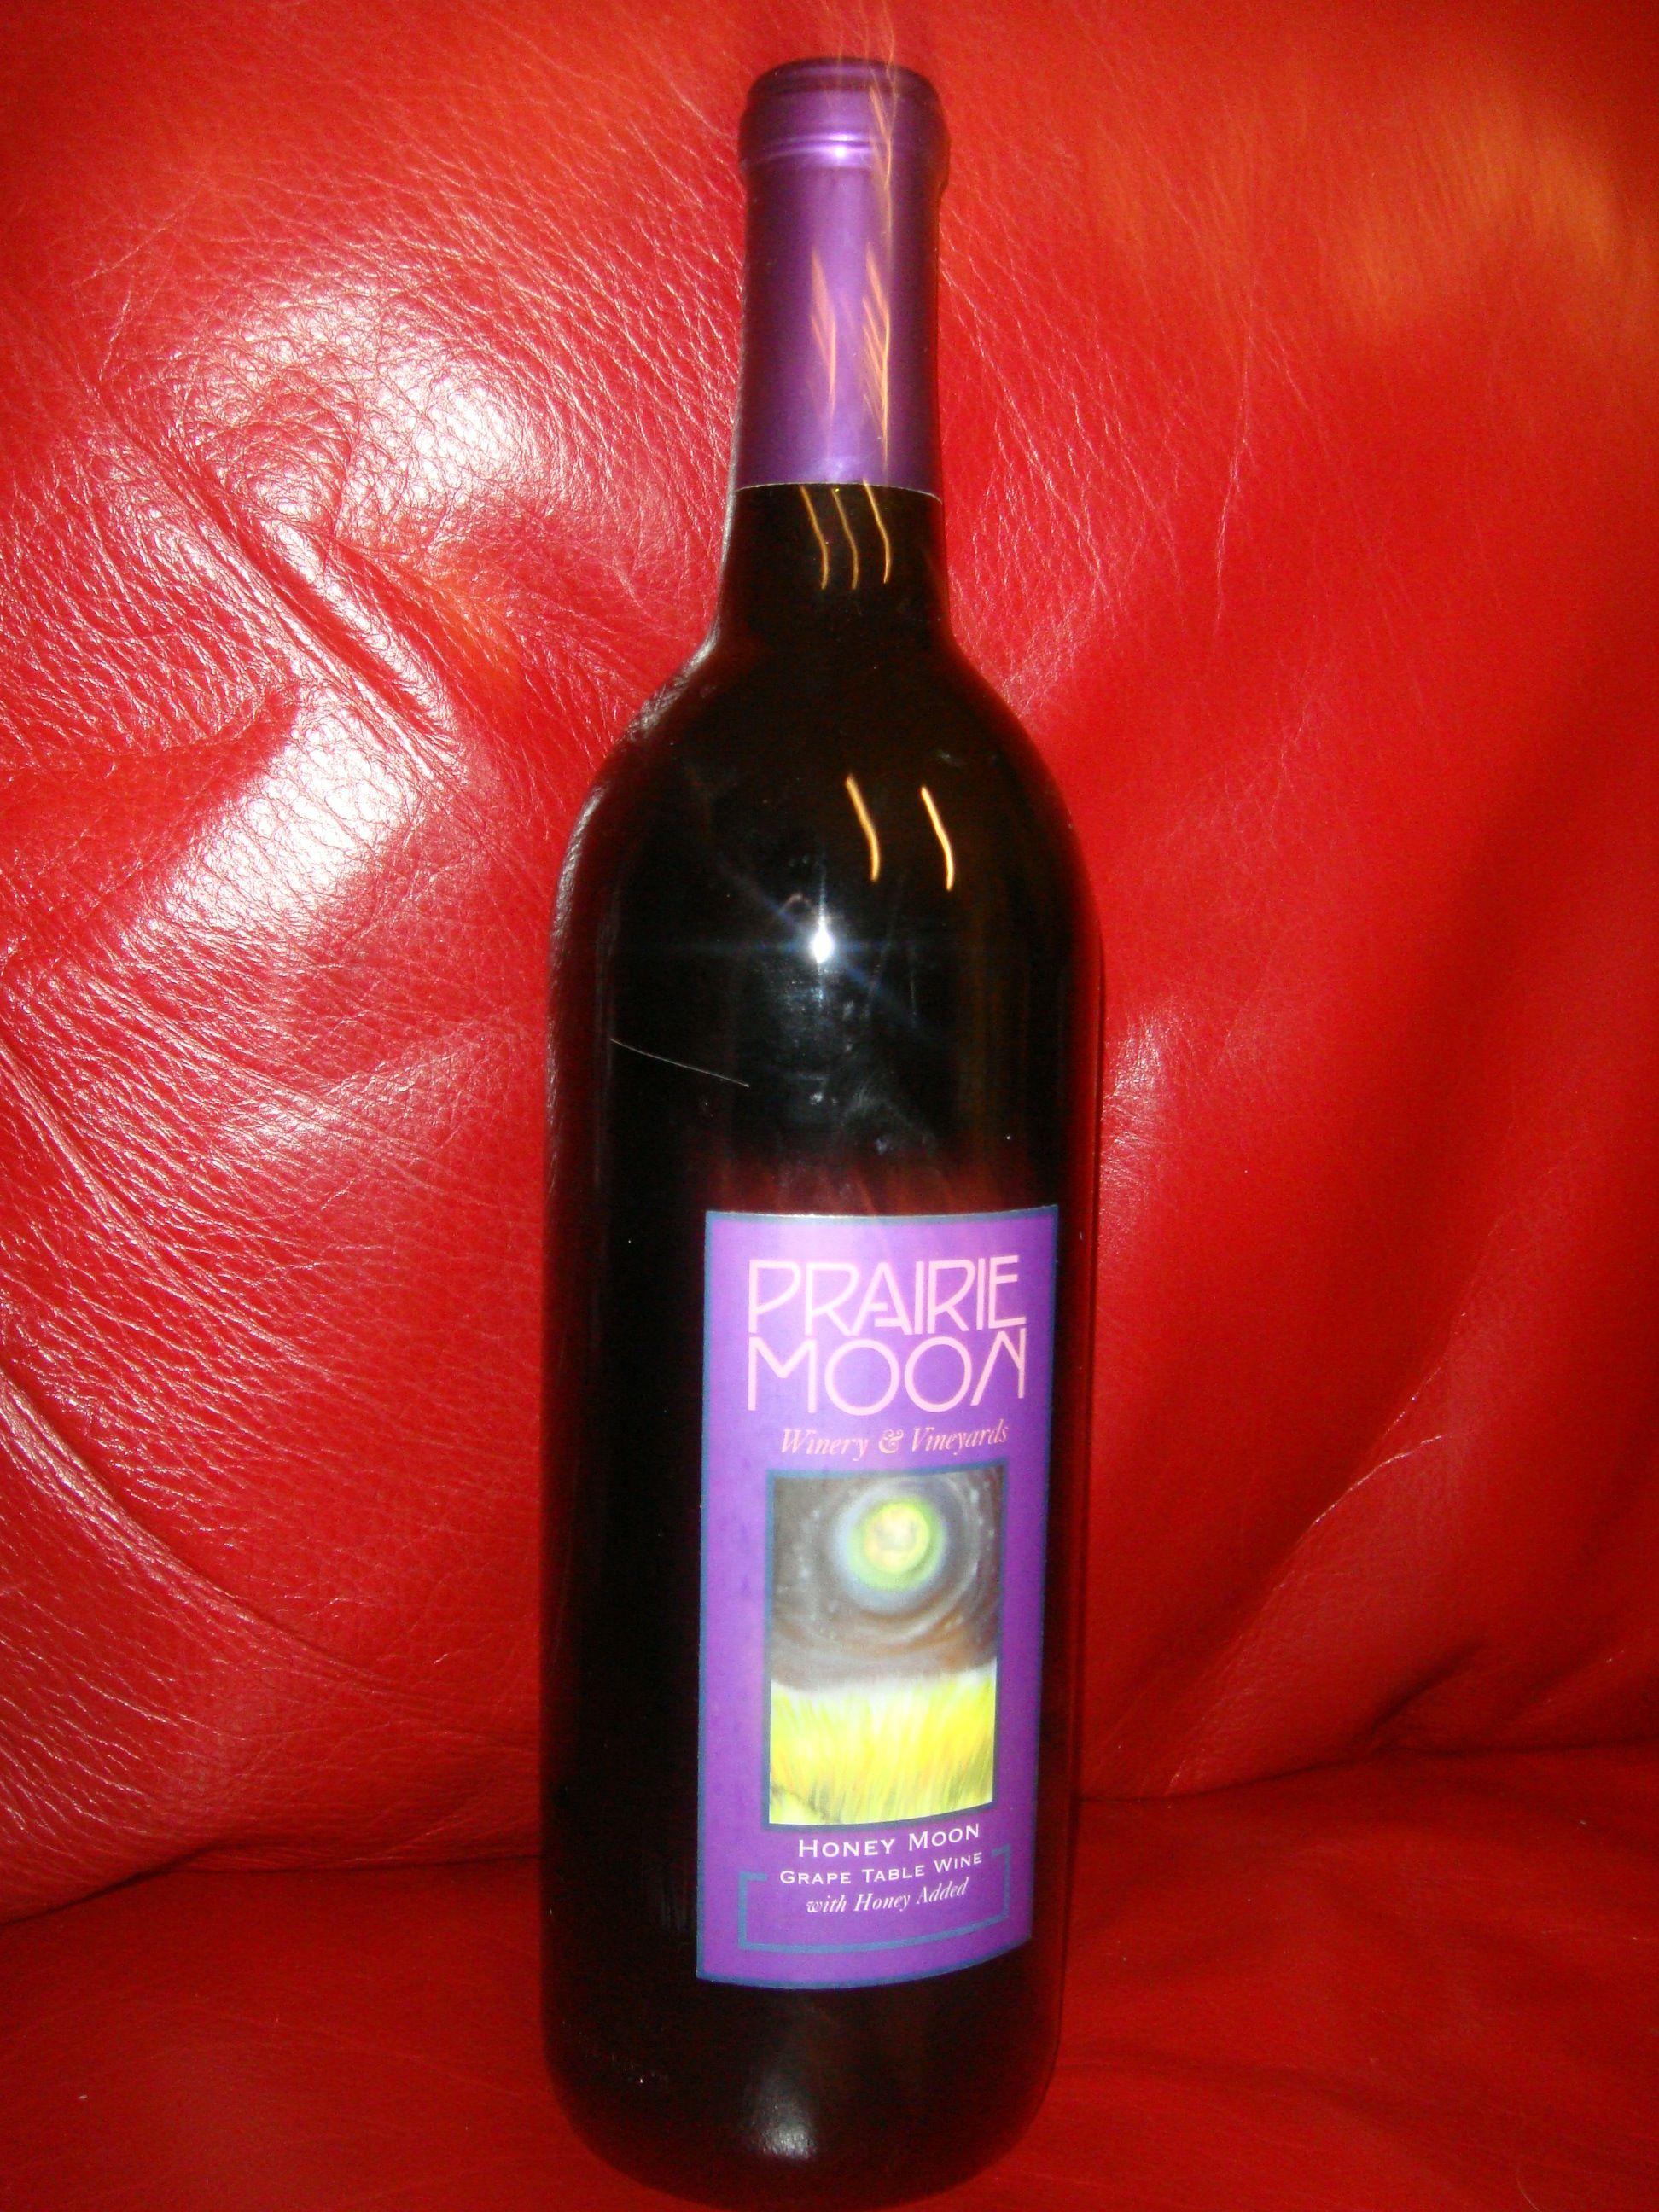 Honey Moon Grape Table Wine With Honey Added By Prairie Moon Winery Vineyards Wine Bottle Wine Distillery